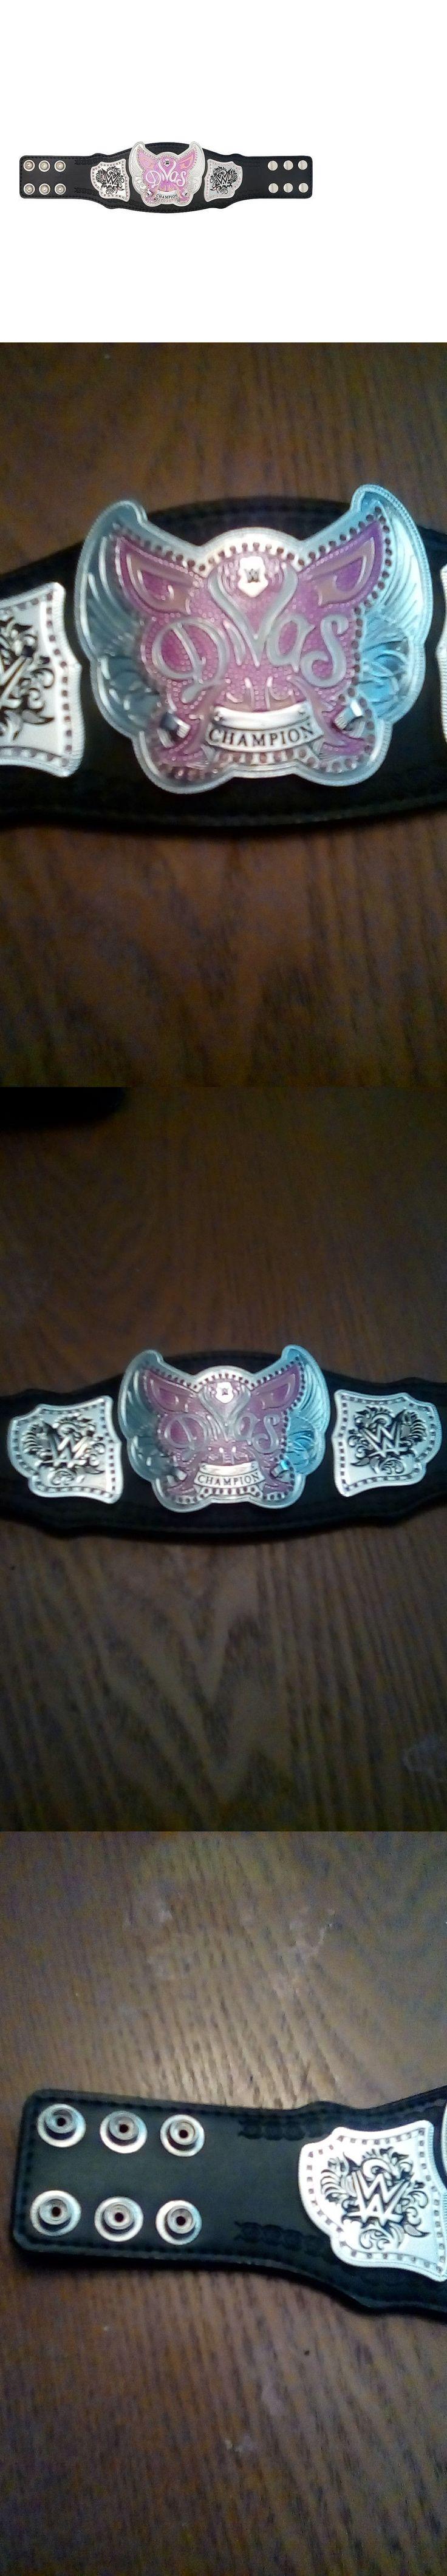 Wrestling 2902: Wwe Divas Mini Replica Championship Belt New W Bag Sasha Banks Nikki Bella Nxt -> BUY IT NOW ONLY: $36.75 on eBay!